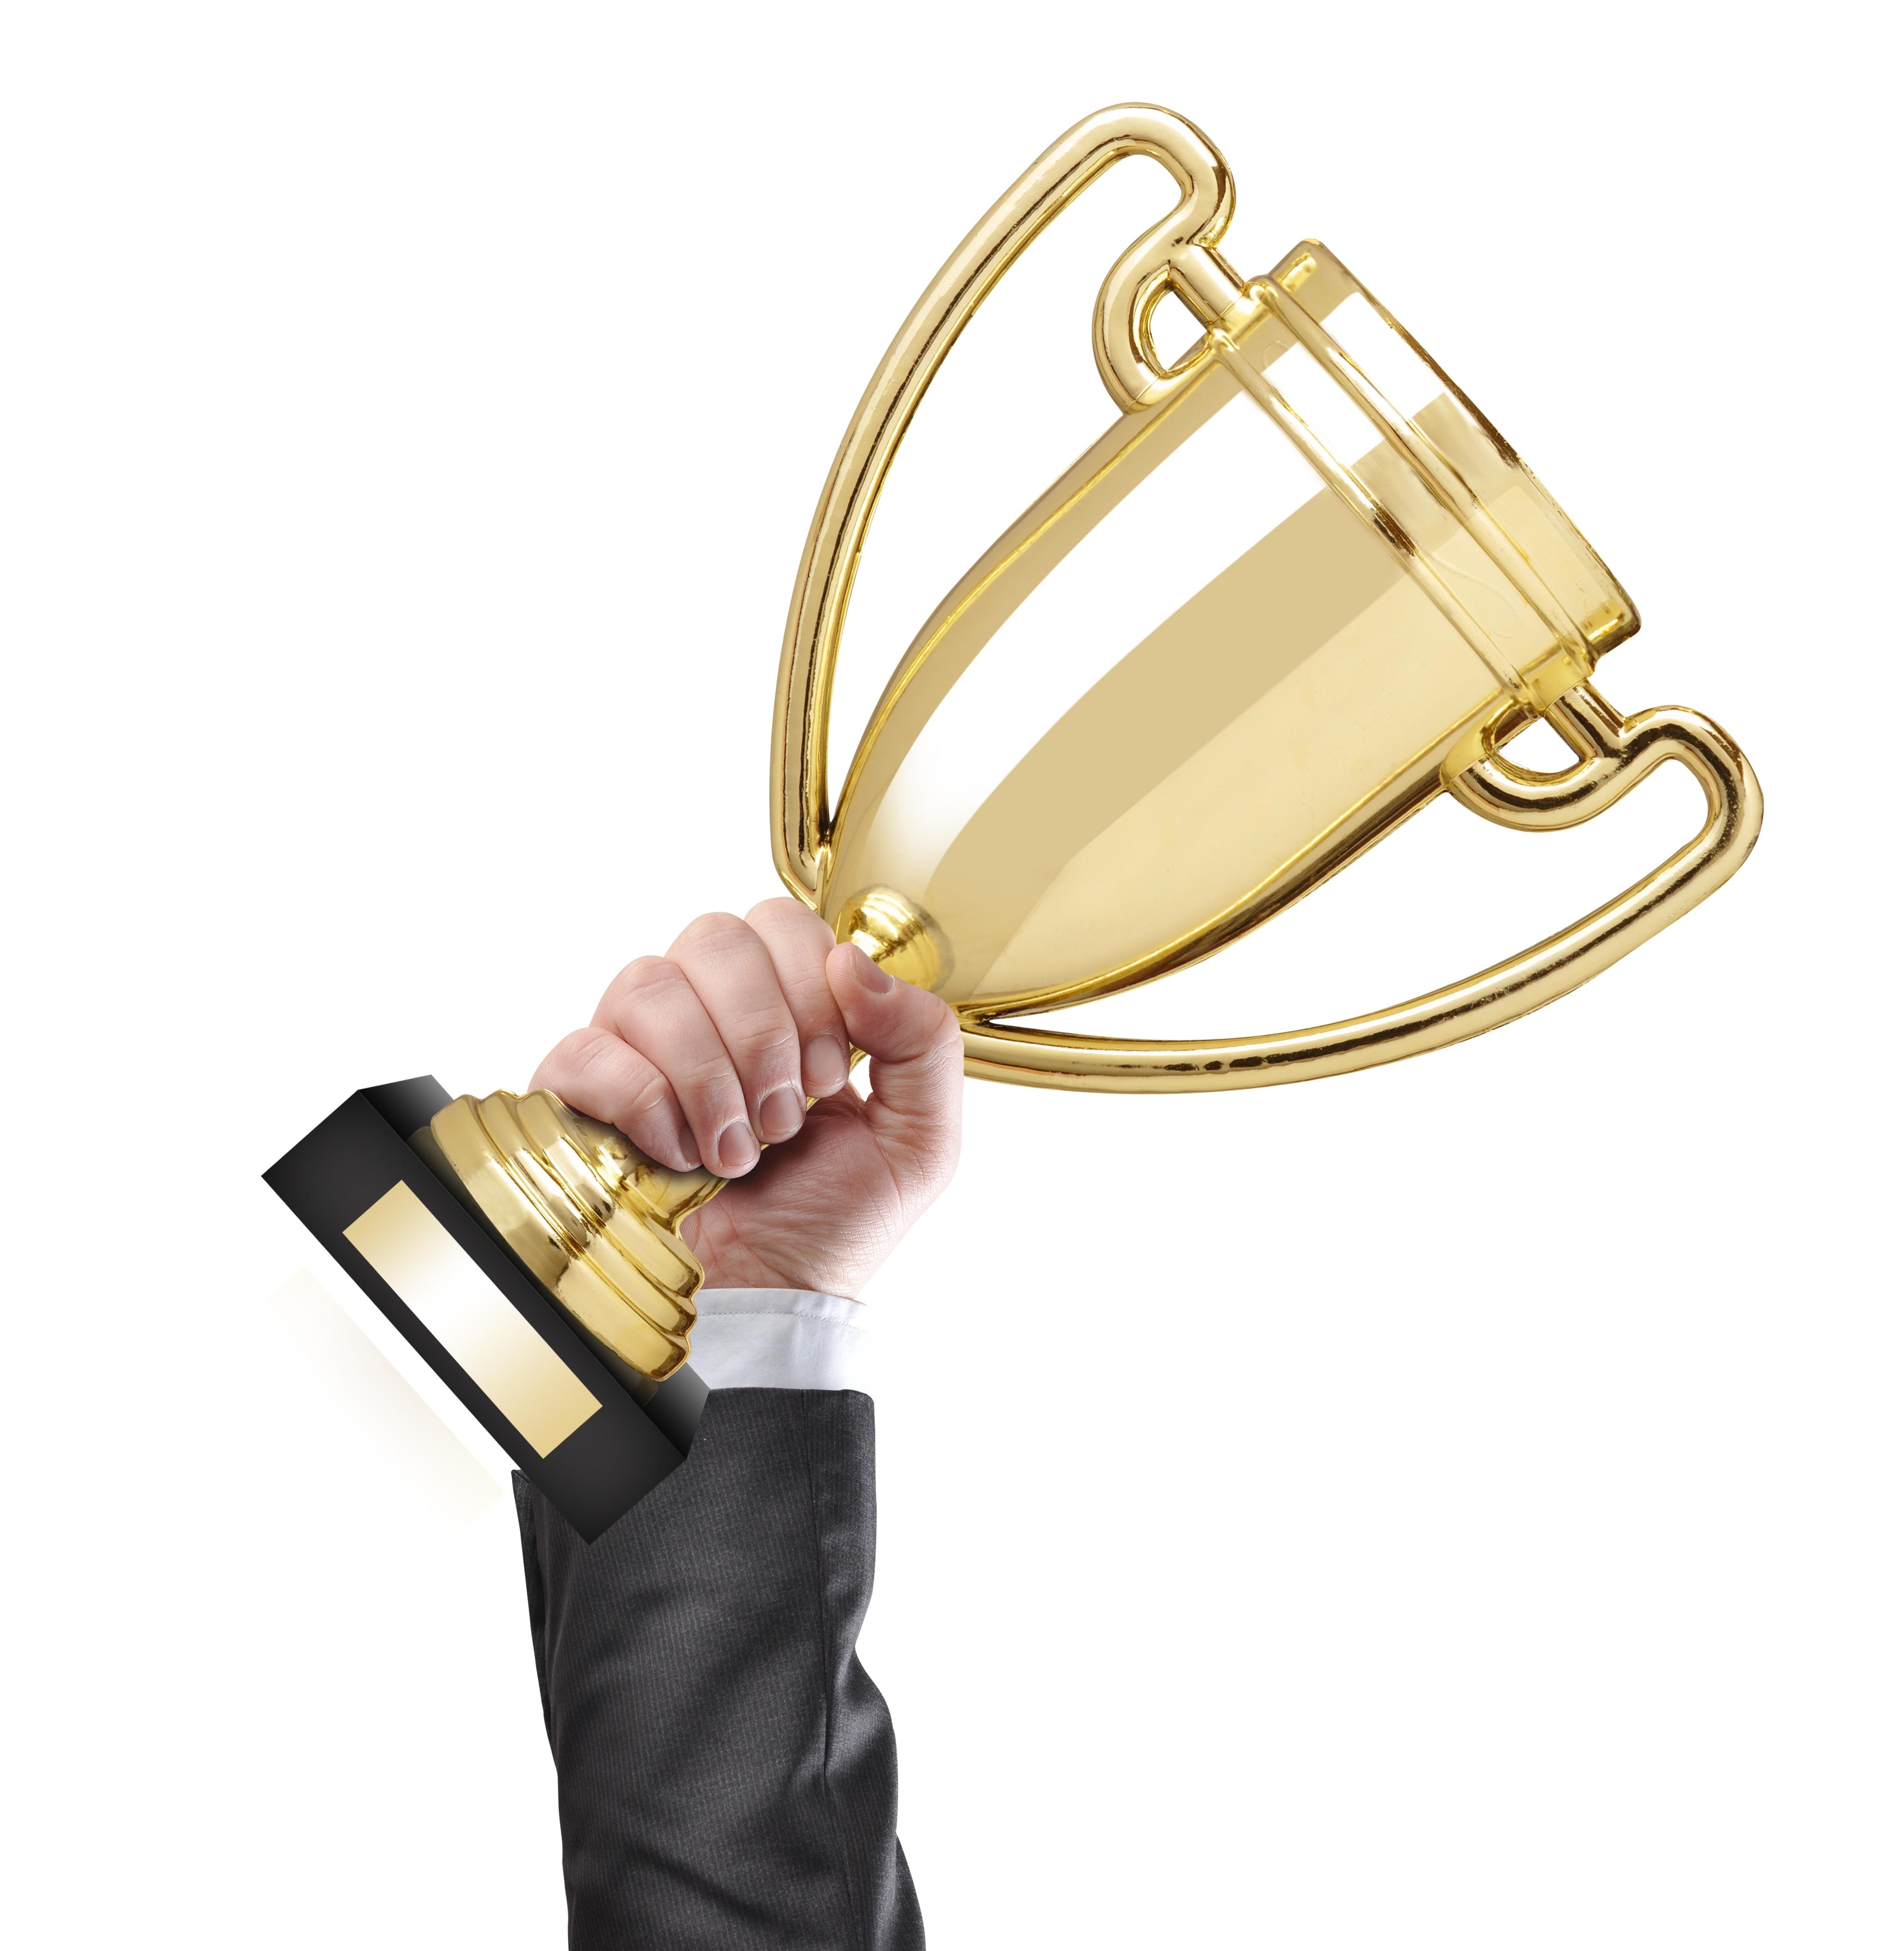 81a24001647ddfcb07b2_a6ae9871be1610be091d_Trophy.jpg